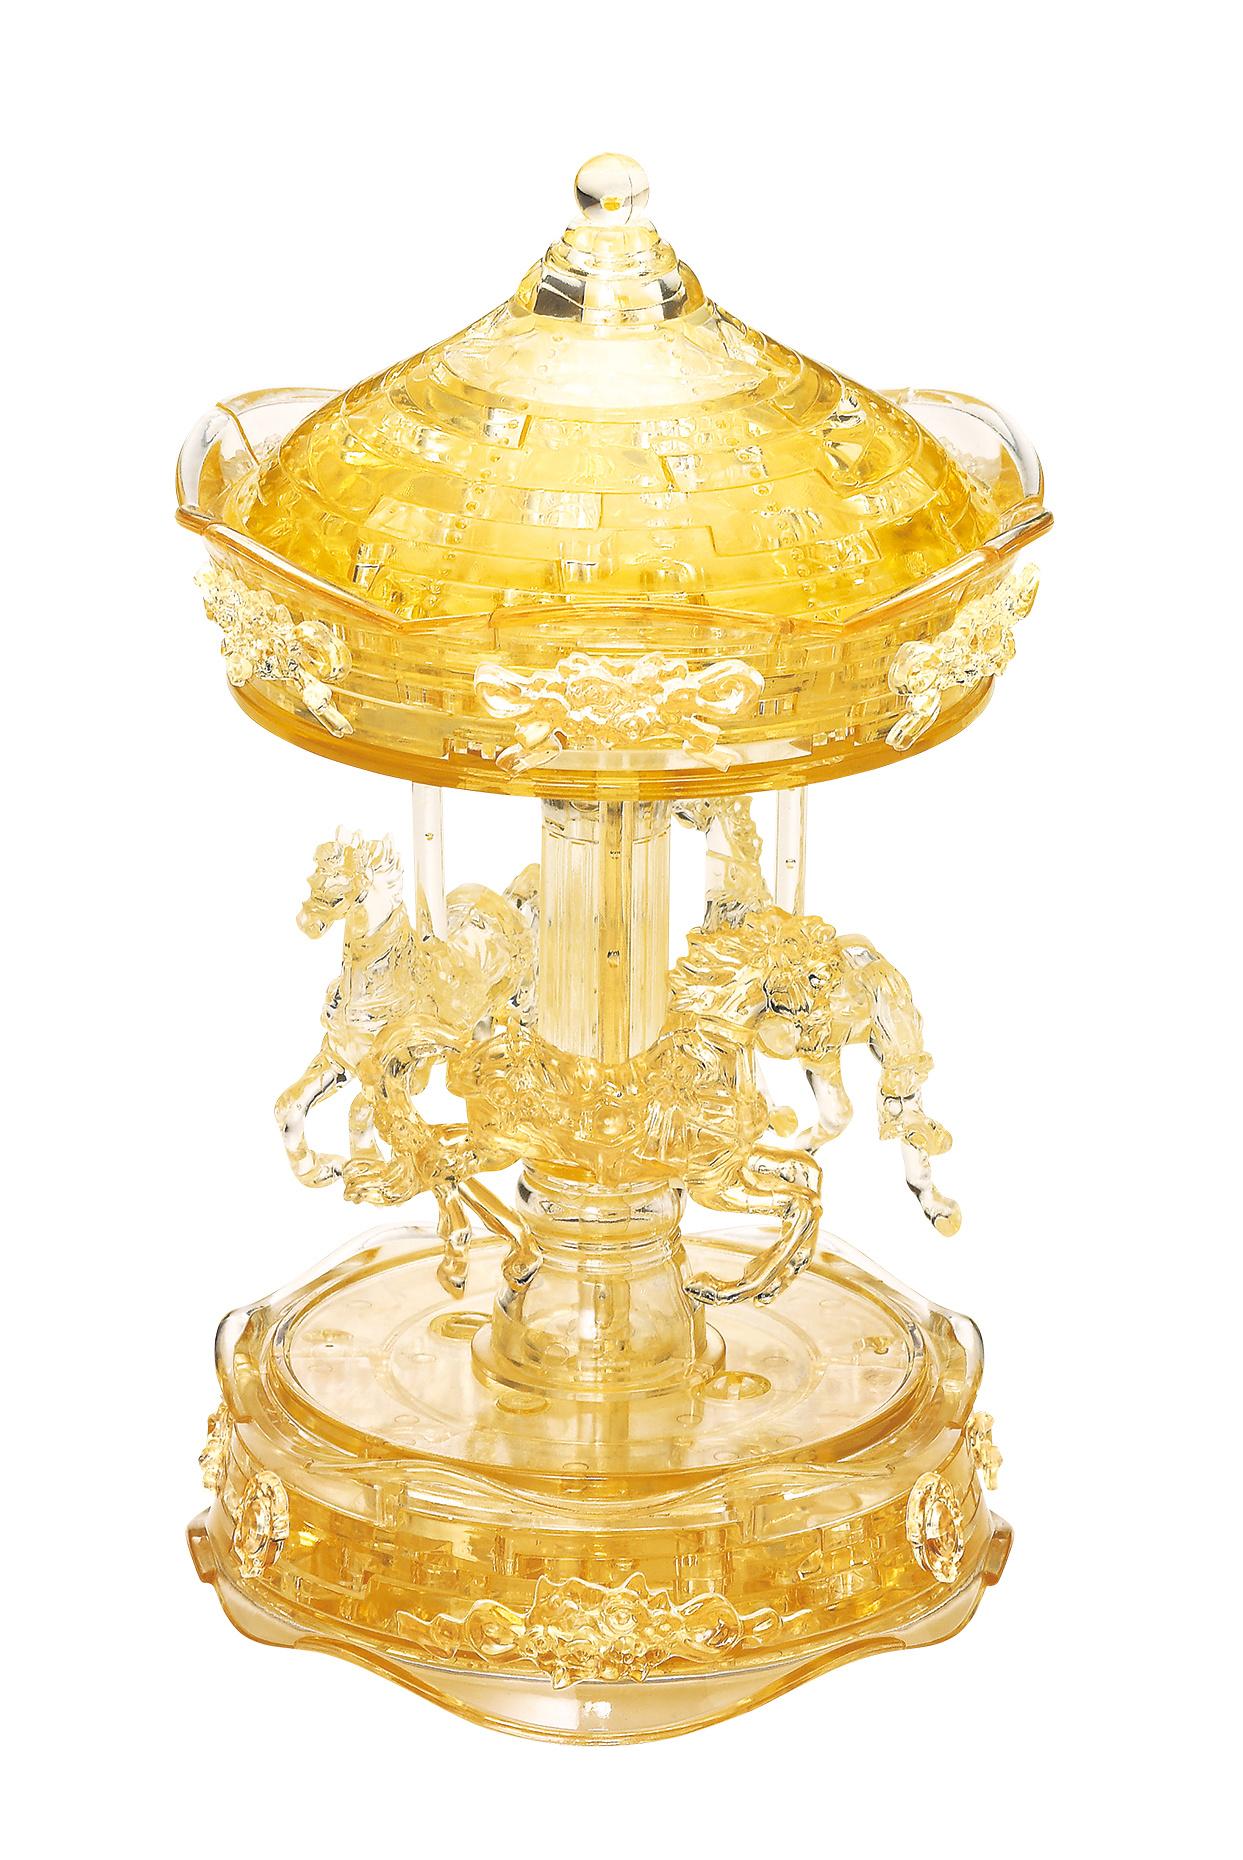 31054 Carousel - gold